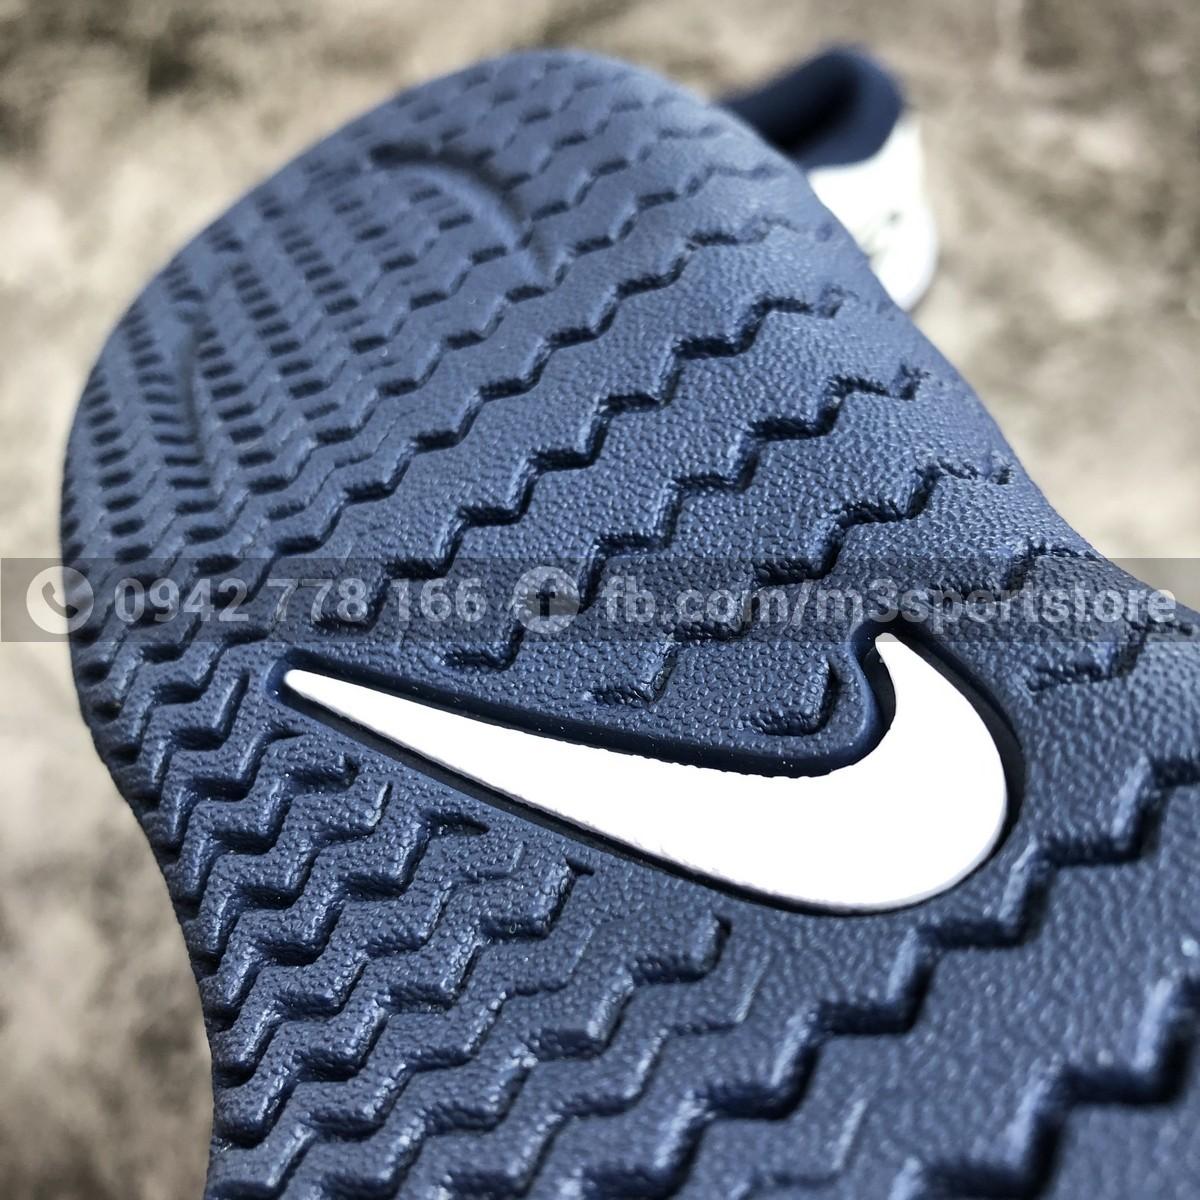 Giầy thể thao nam Nike Court Tech Challenge 20 BQ0234-103